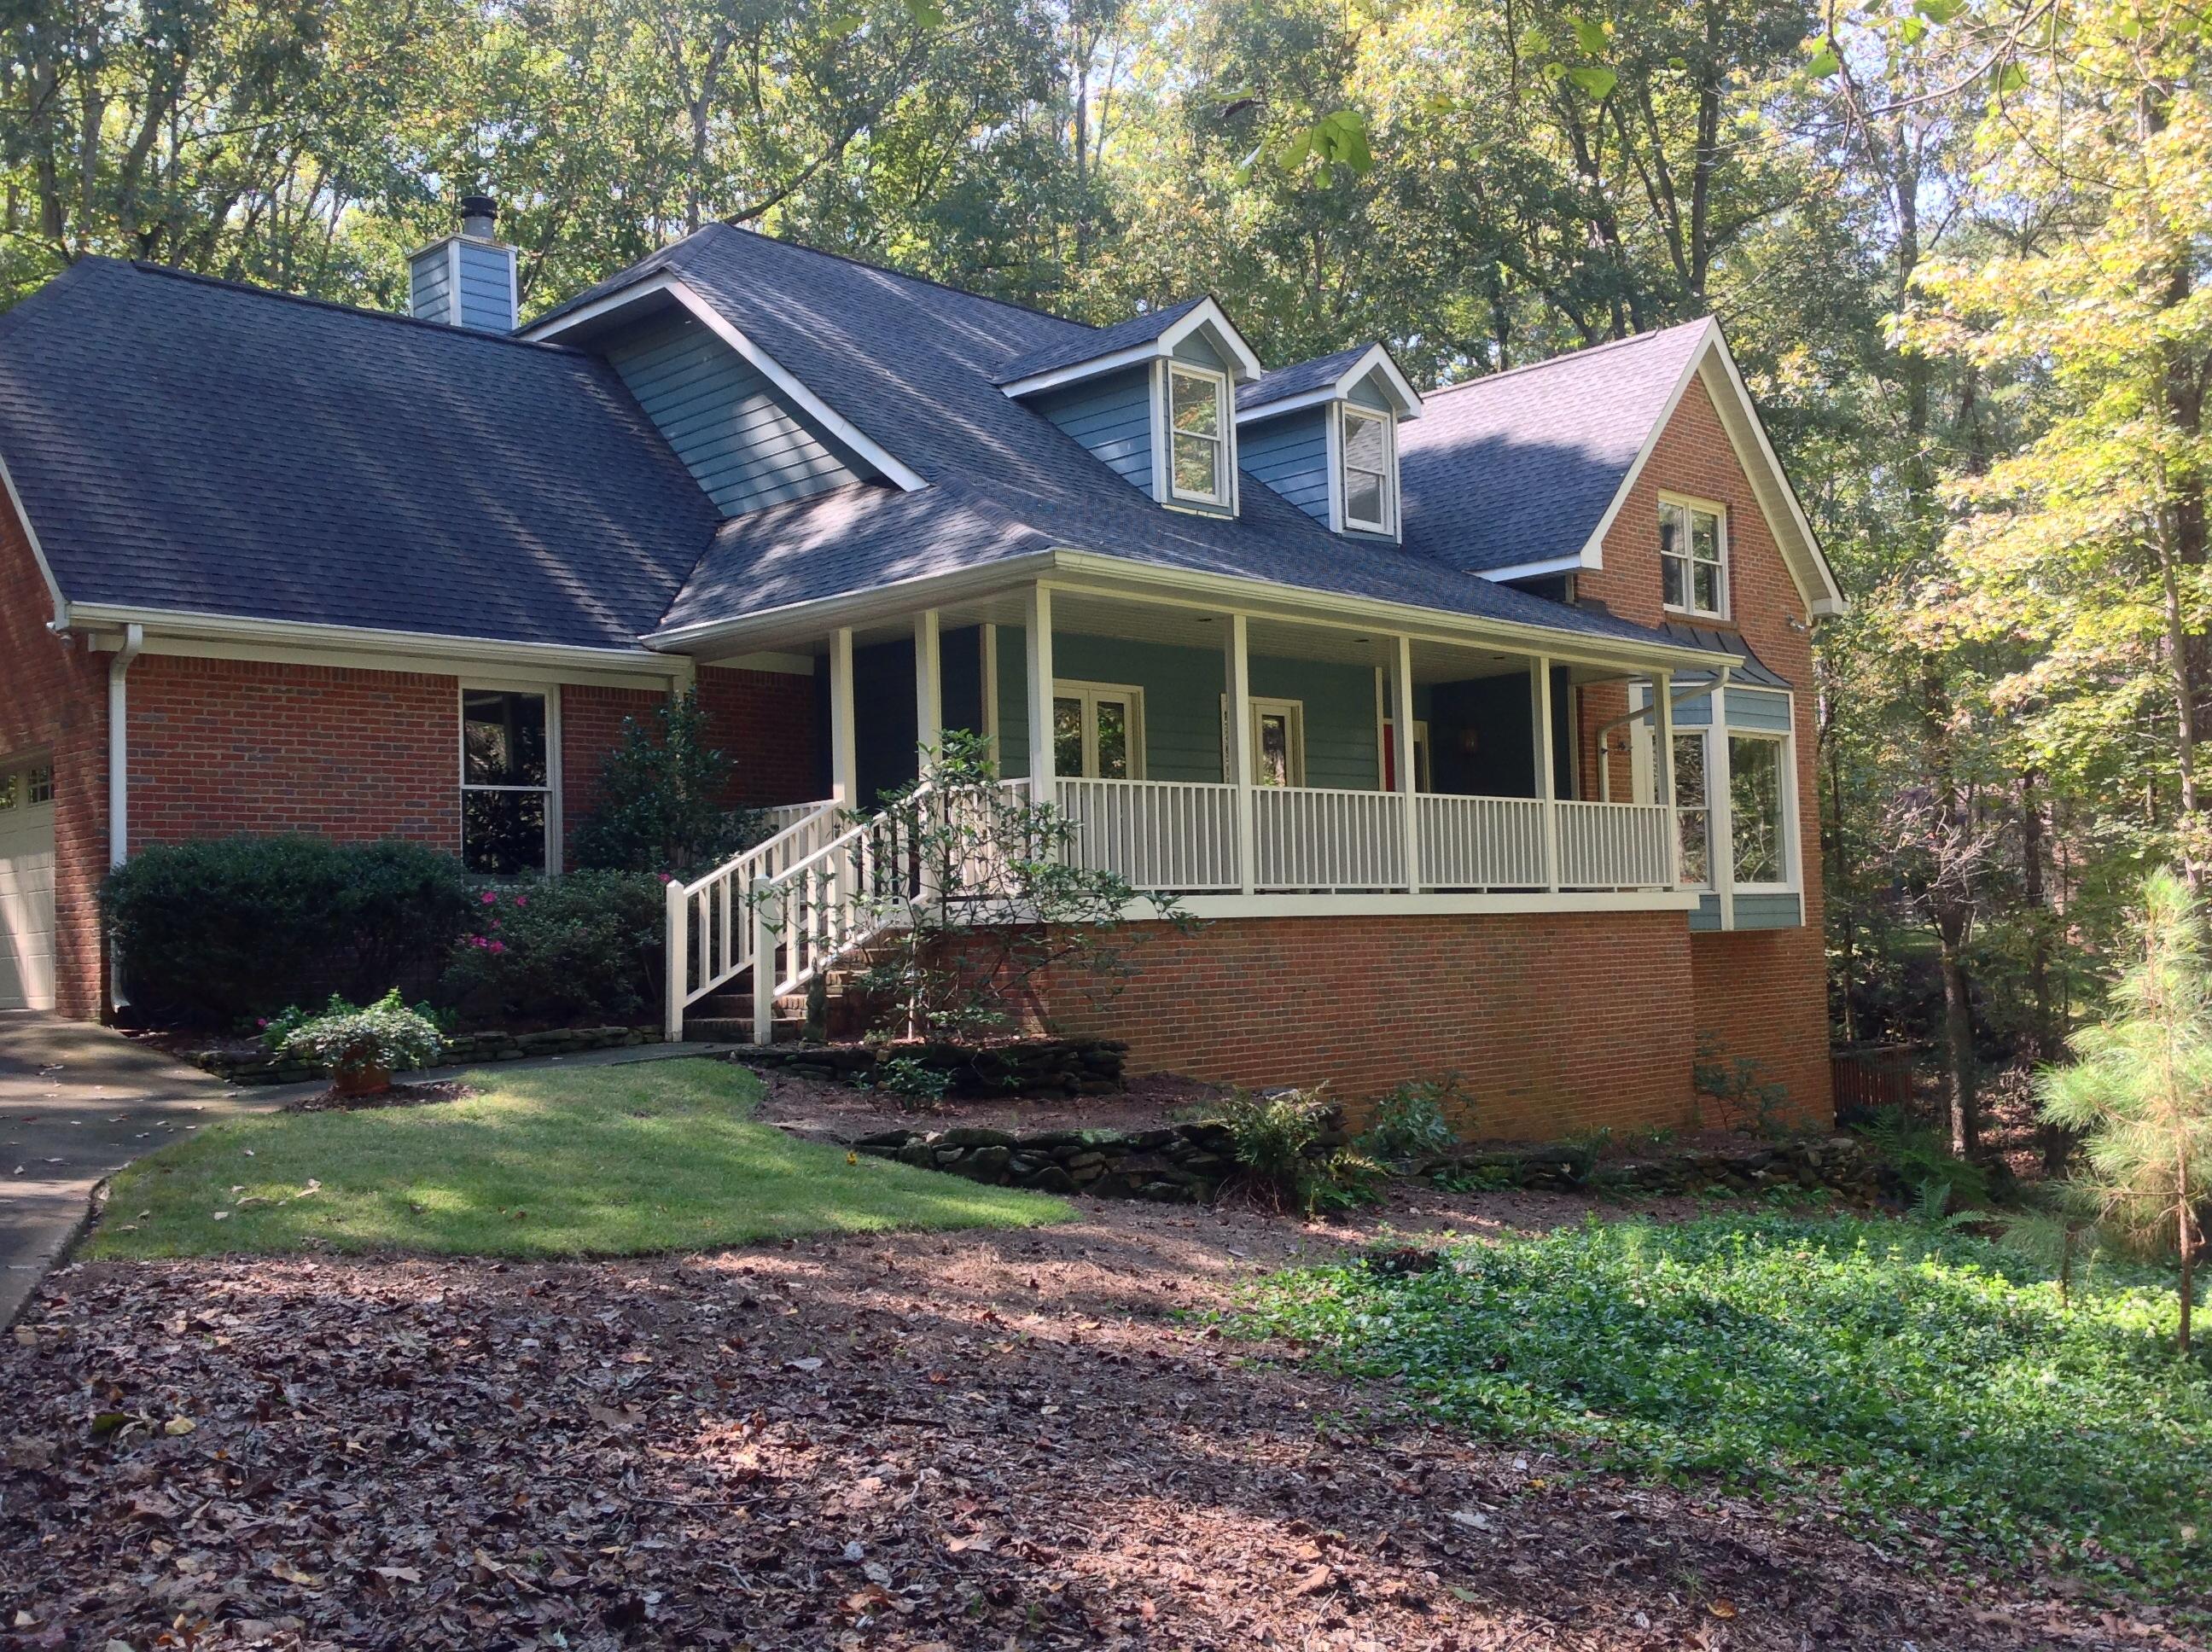 独户住宅 为 销售 在 Impressive Home in Johns Creek 430 Link Road Johns Creek, 乔治亚州 30022 美国